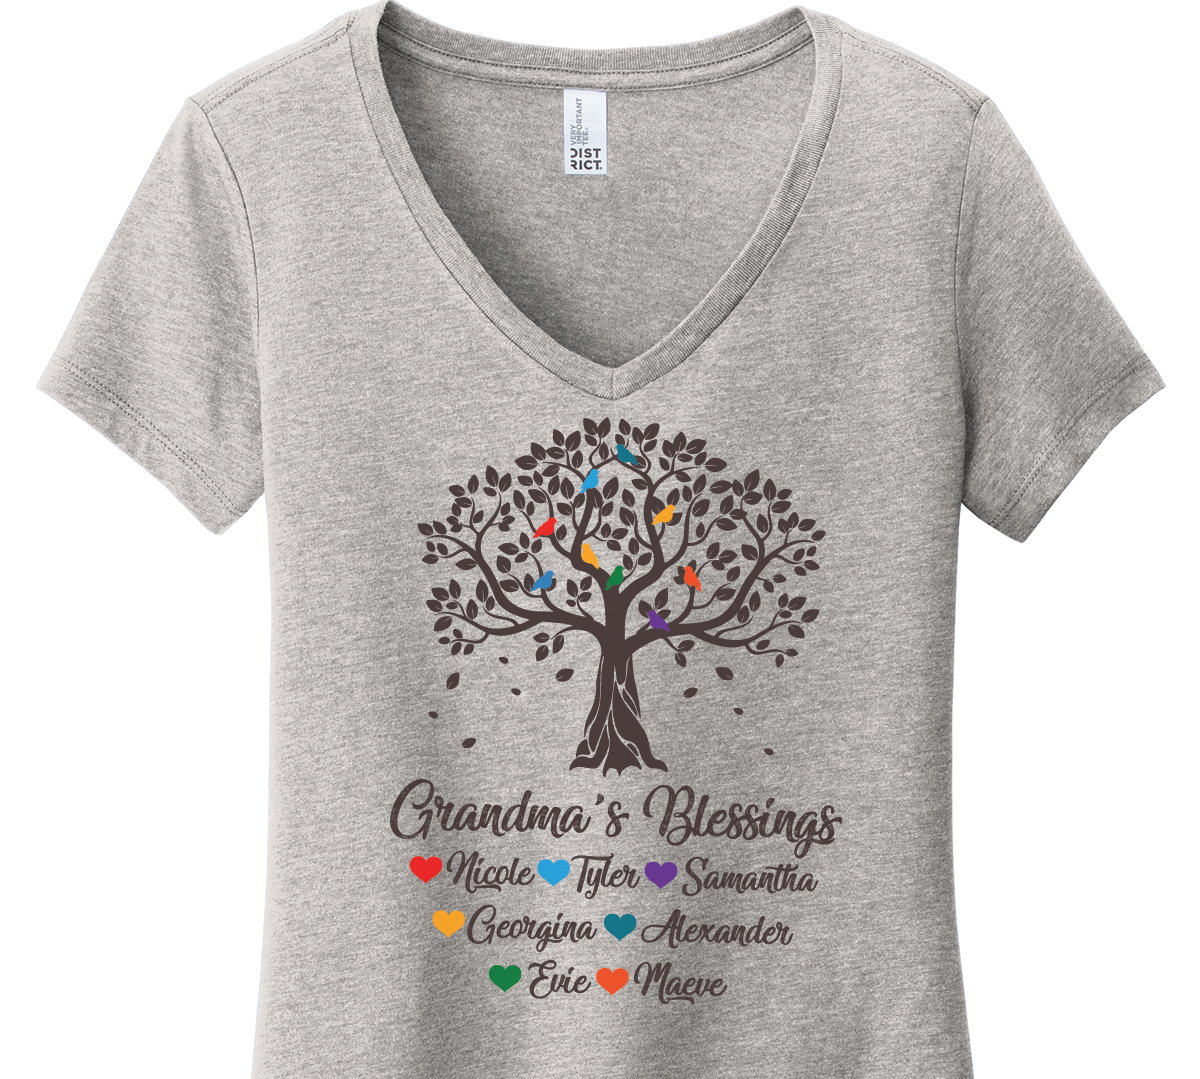 Grandma Tree Blessings Shirts with Grandkids Names